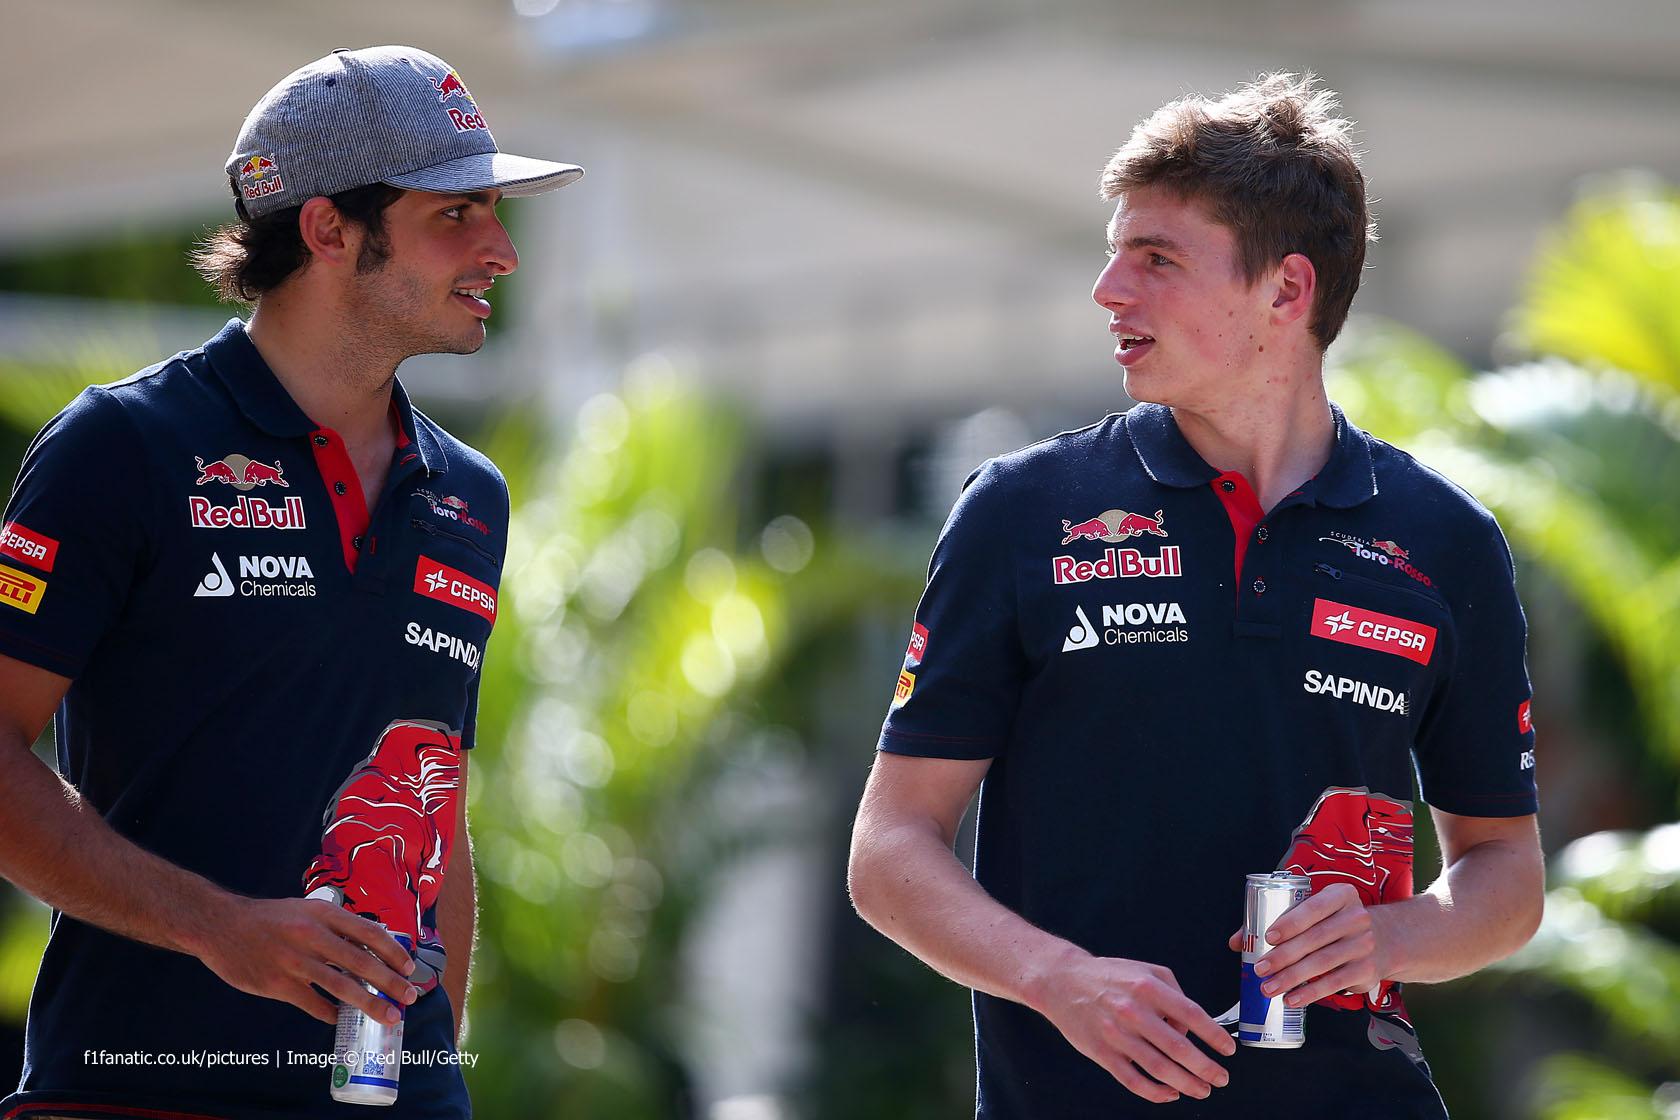 Carlos Sainz Jnr, Max Verstappen, Toro Rosso, Sepang International Circuit, 2015